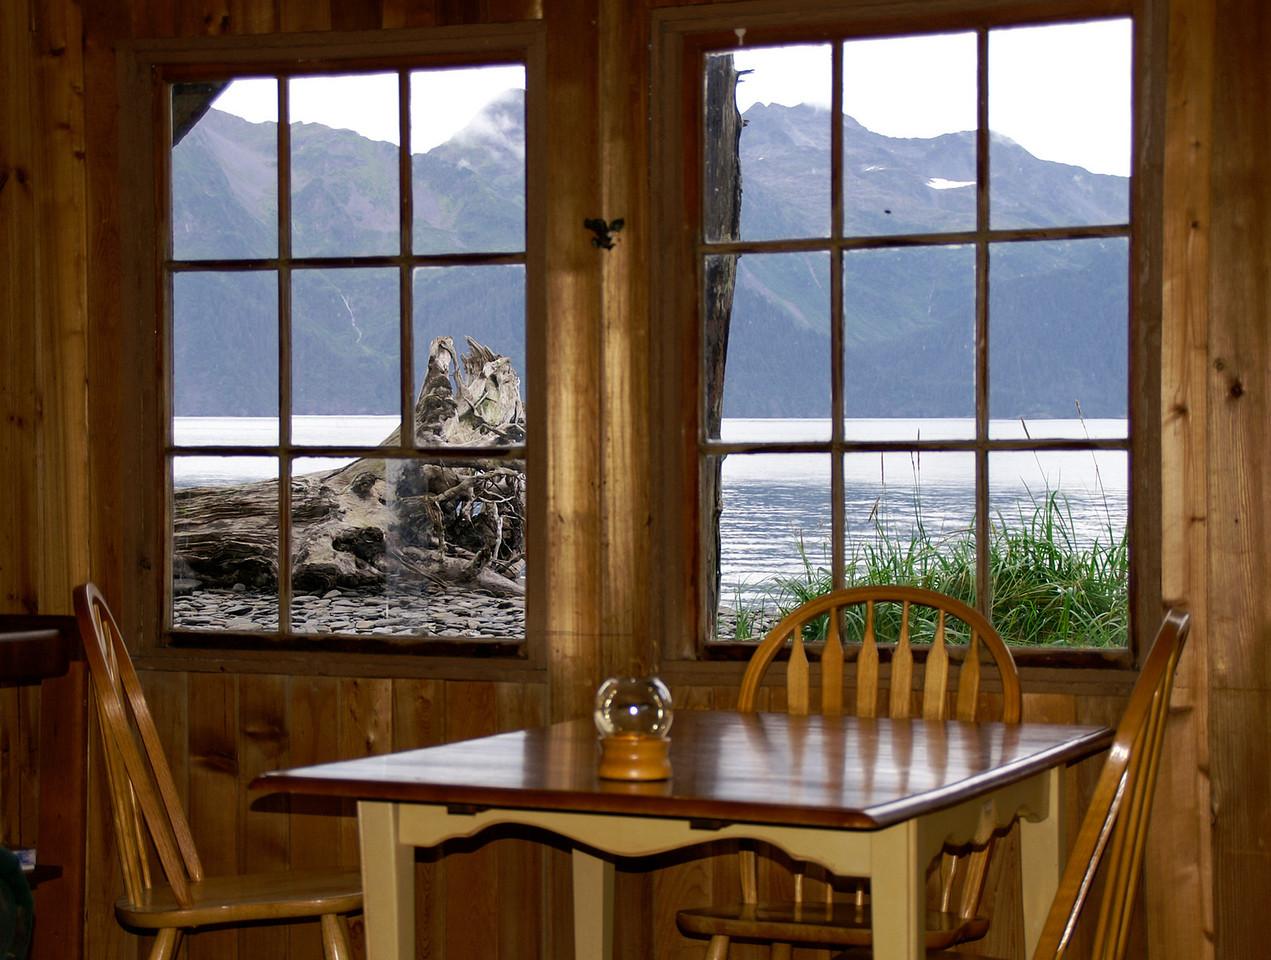 Kenai Fjords National Park, Resurrection Bay, Alaska